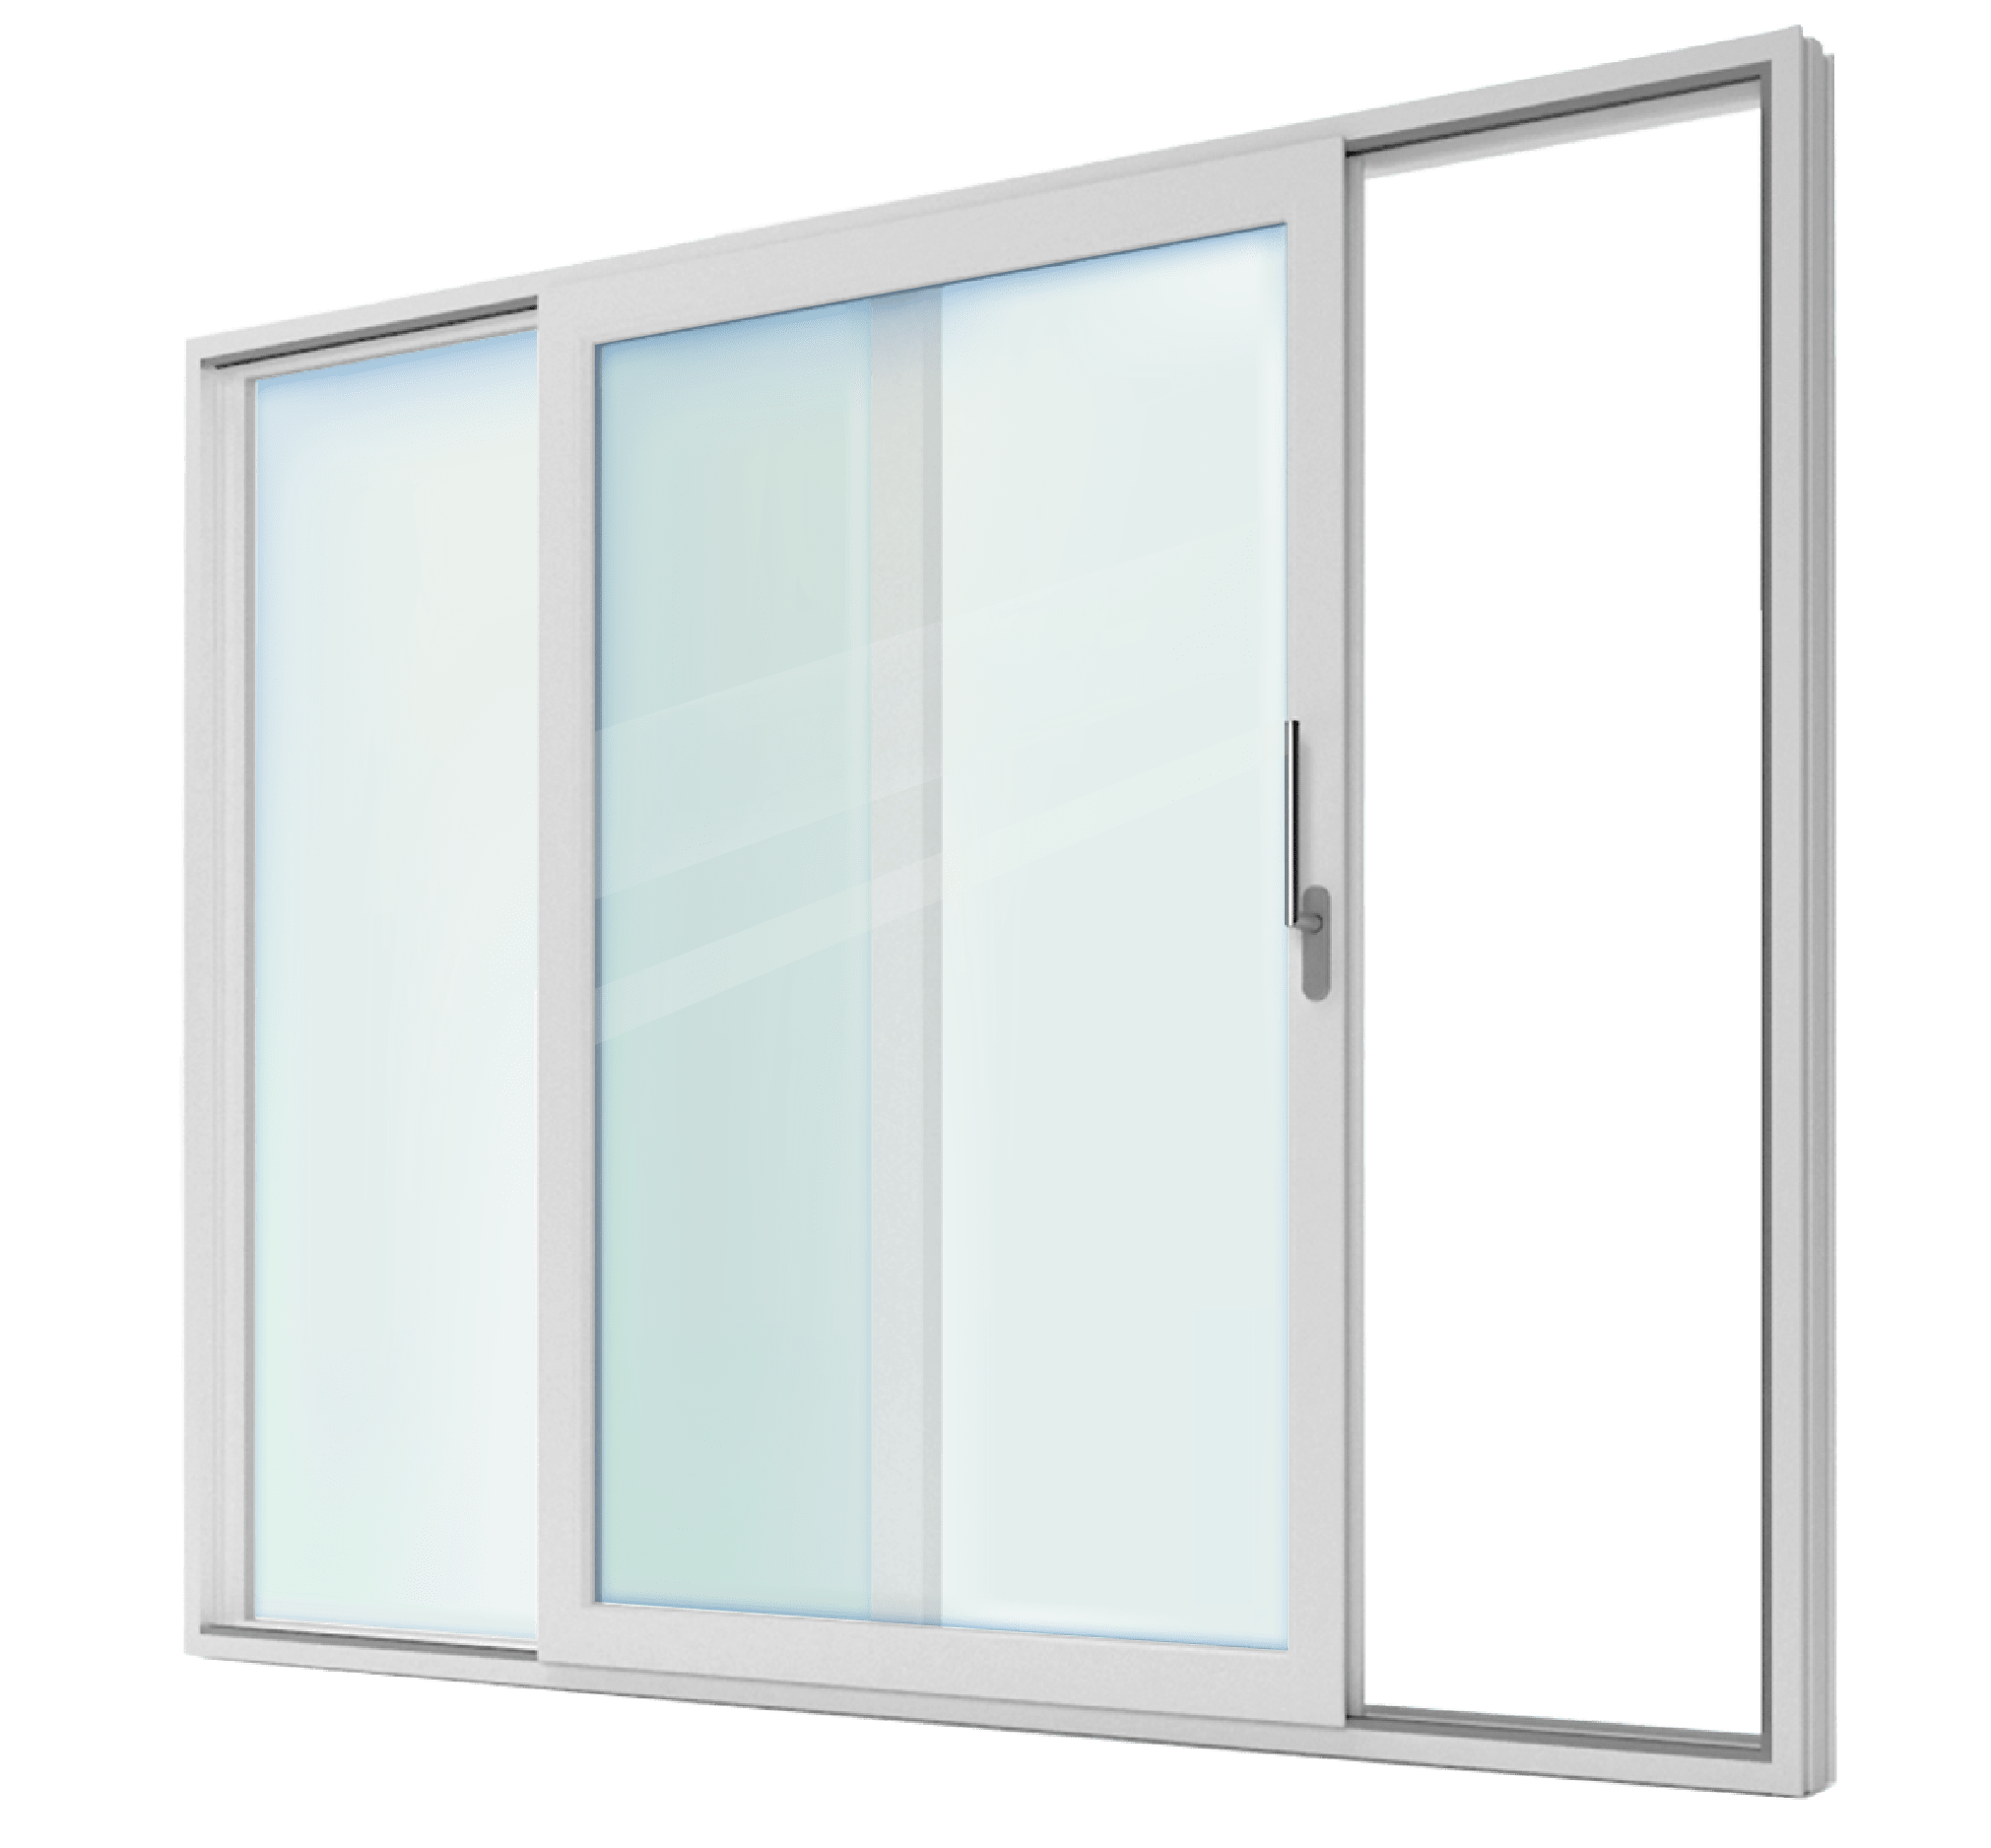 Раздвижные двери Smart Slide-фото